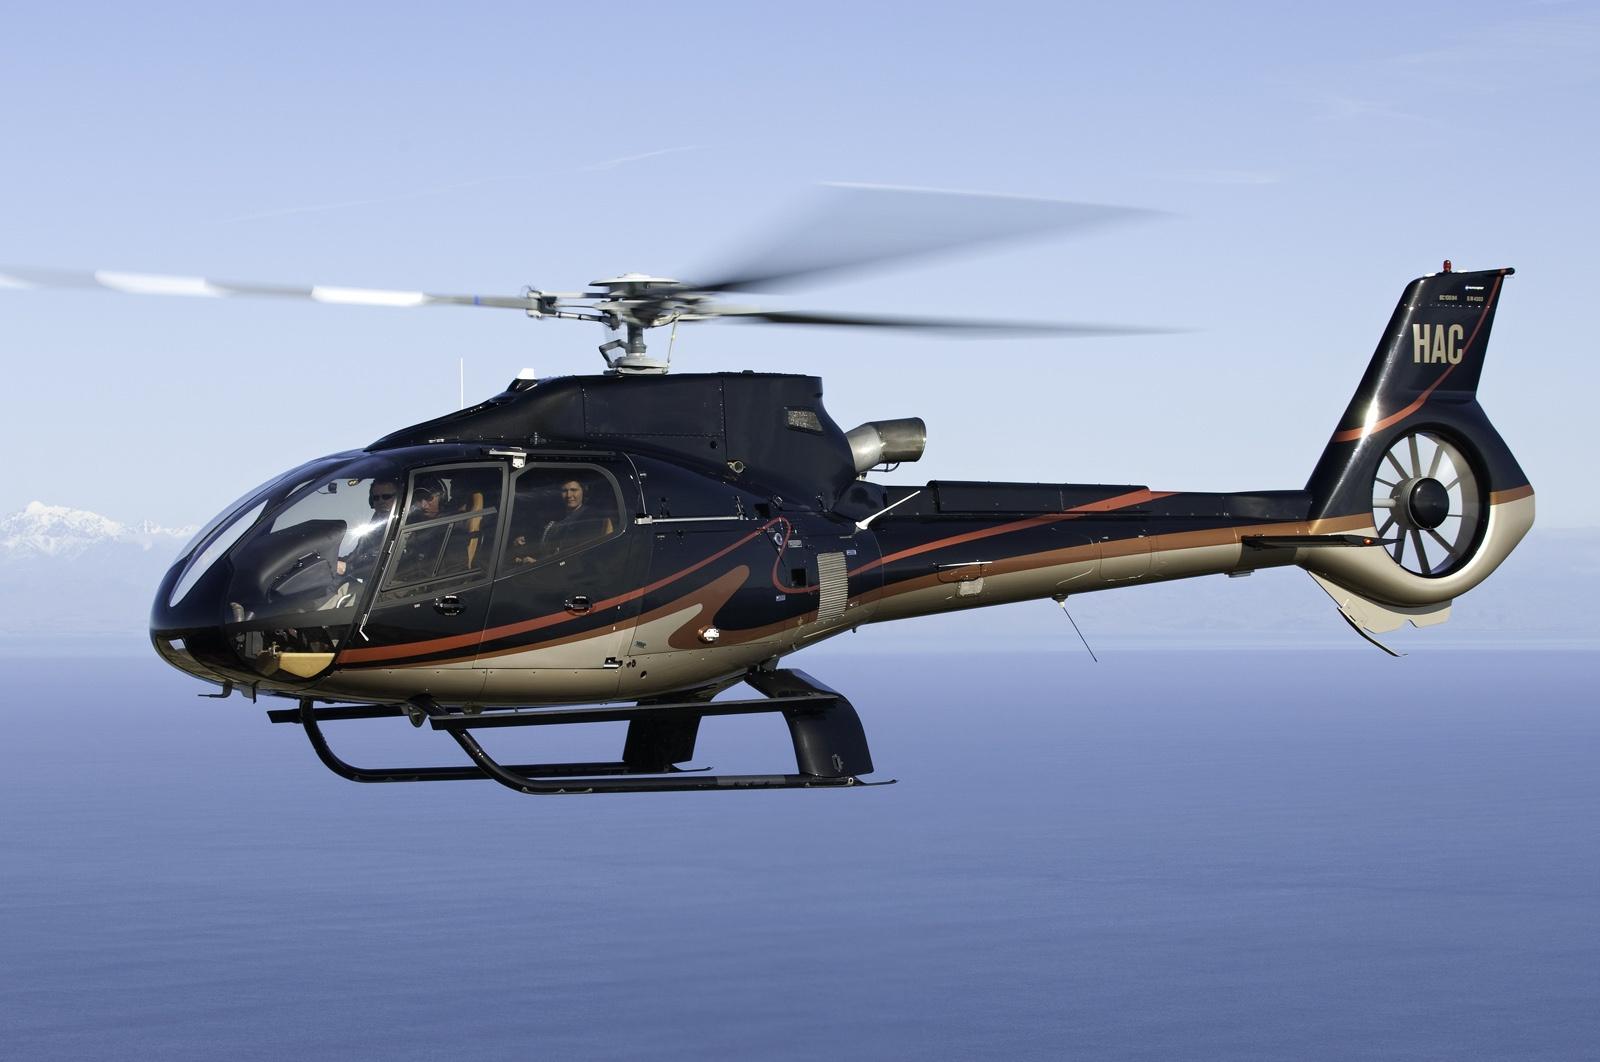 http://2.bp.blogspot.com/-UzRUCqeOryg/T7ZsVn2MdTI/AAAAAAAAIJc/uJ4jgB7OLJc/s1600/eurocopter_ec130b4_hac.jpg